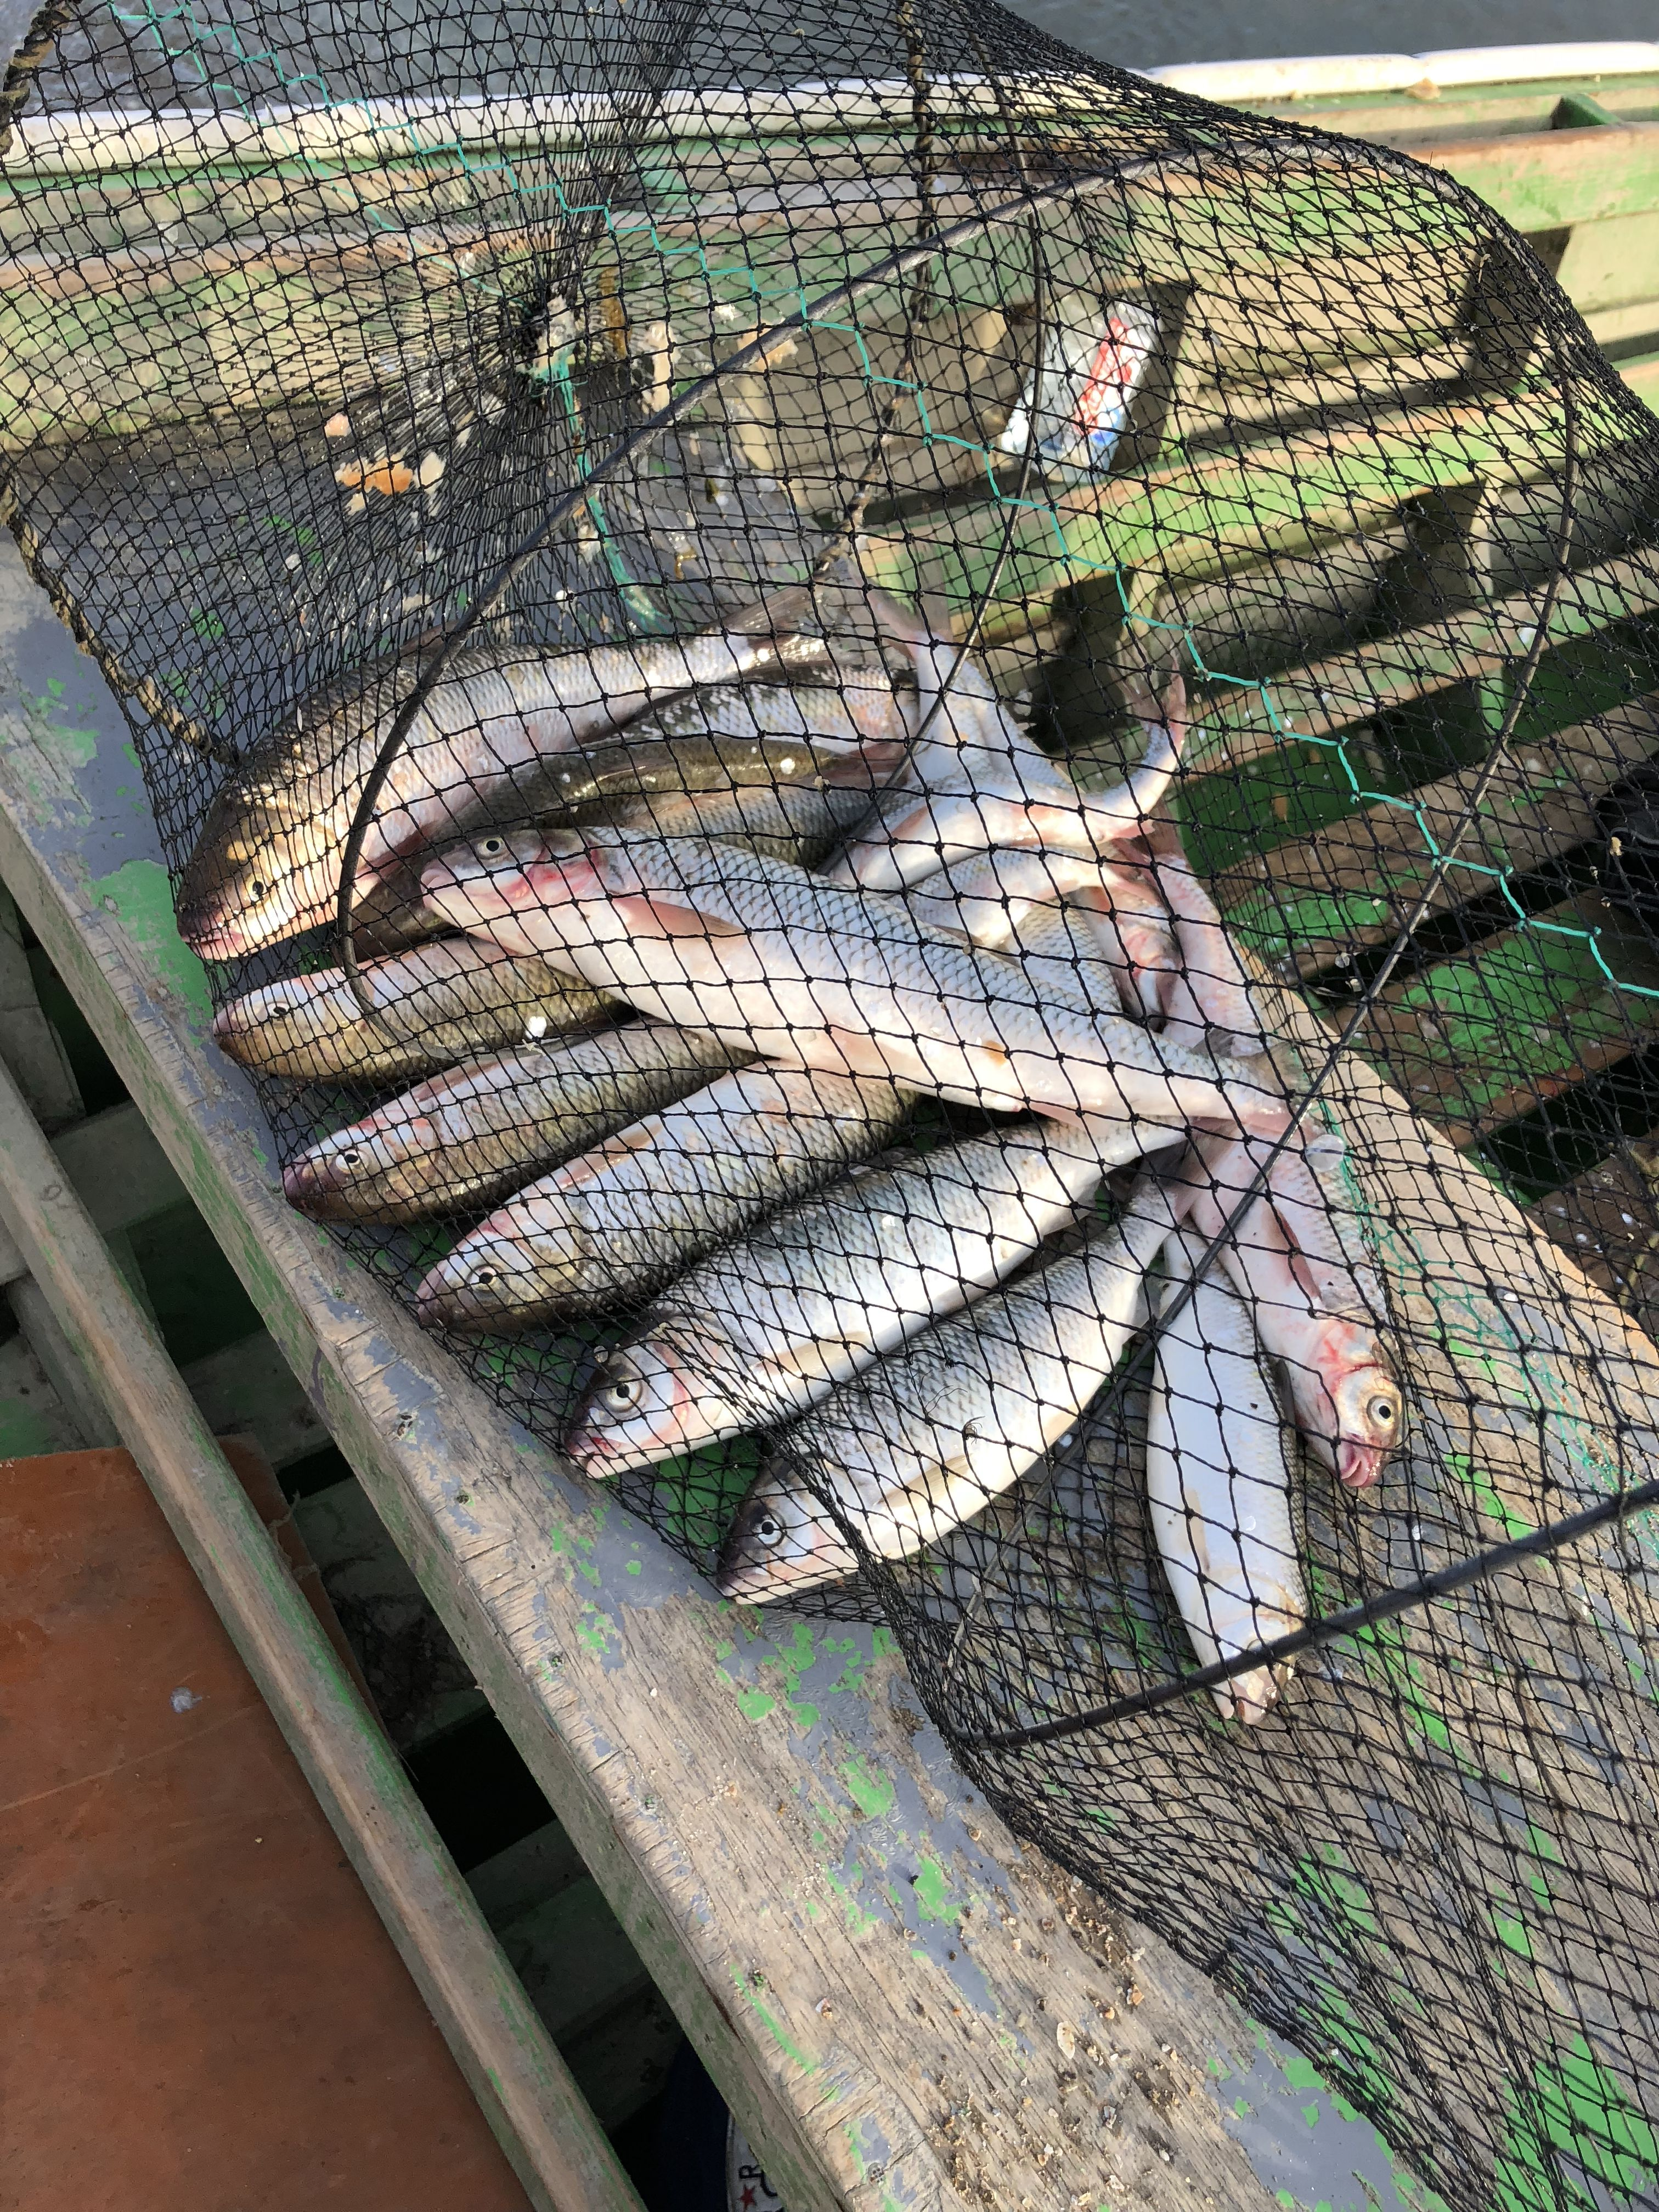 Pin by Amraliyev Elnur on Fishing | Fish, Meat, Food